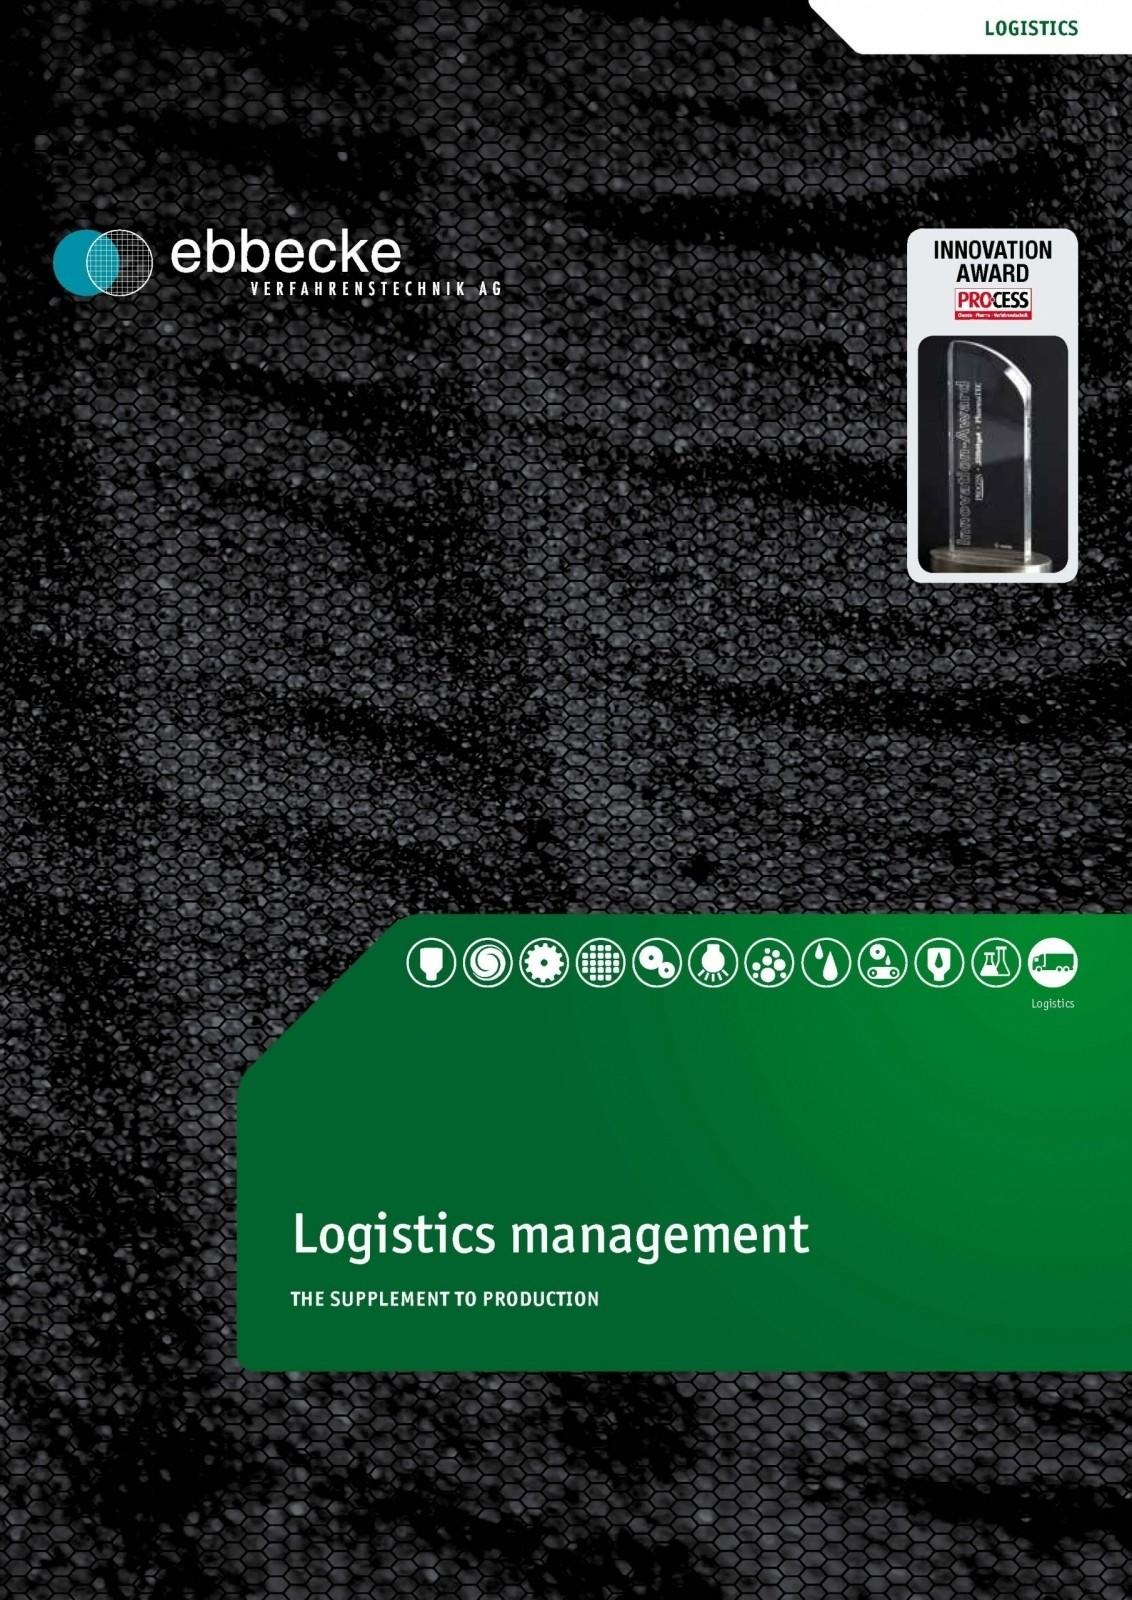 Ebbecke Verfahrenstechnik Flyer Logistik